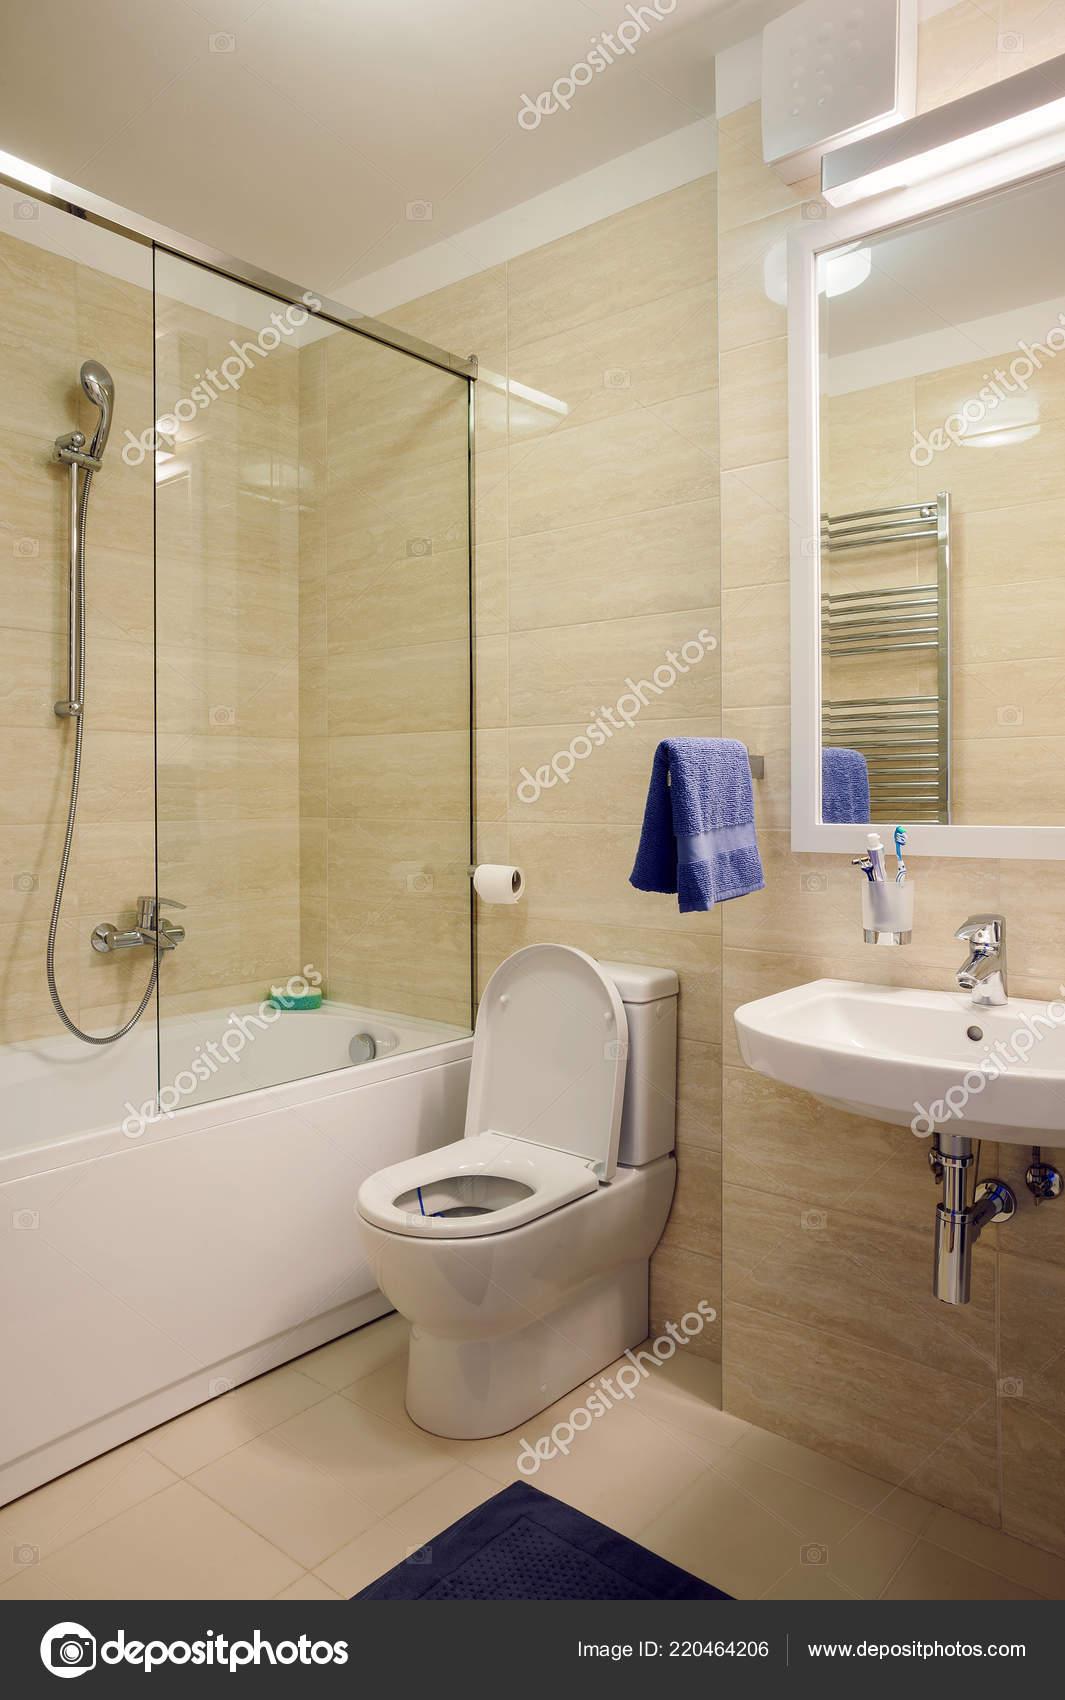 Interior Apartamento Pequeño Moderno Cuarto Baño Detalles Estilo ...